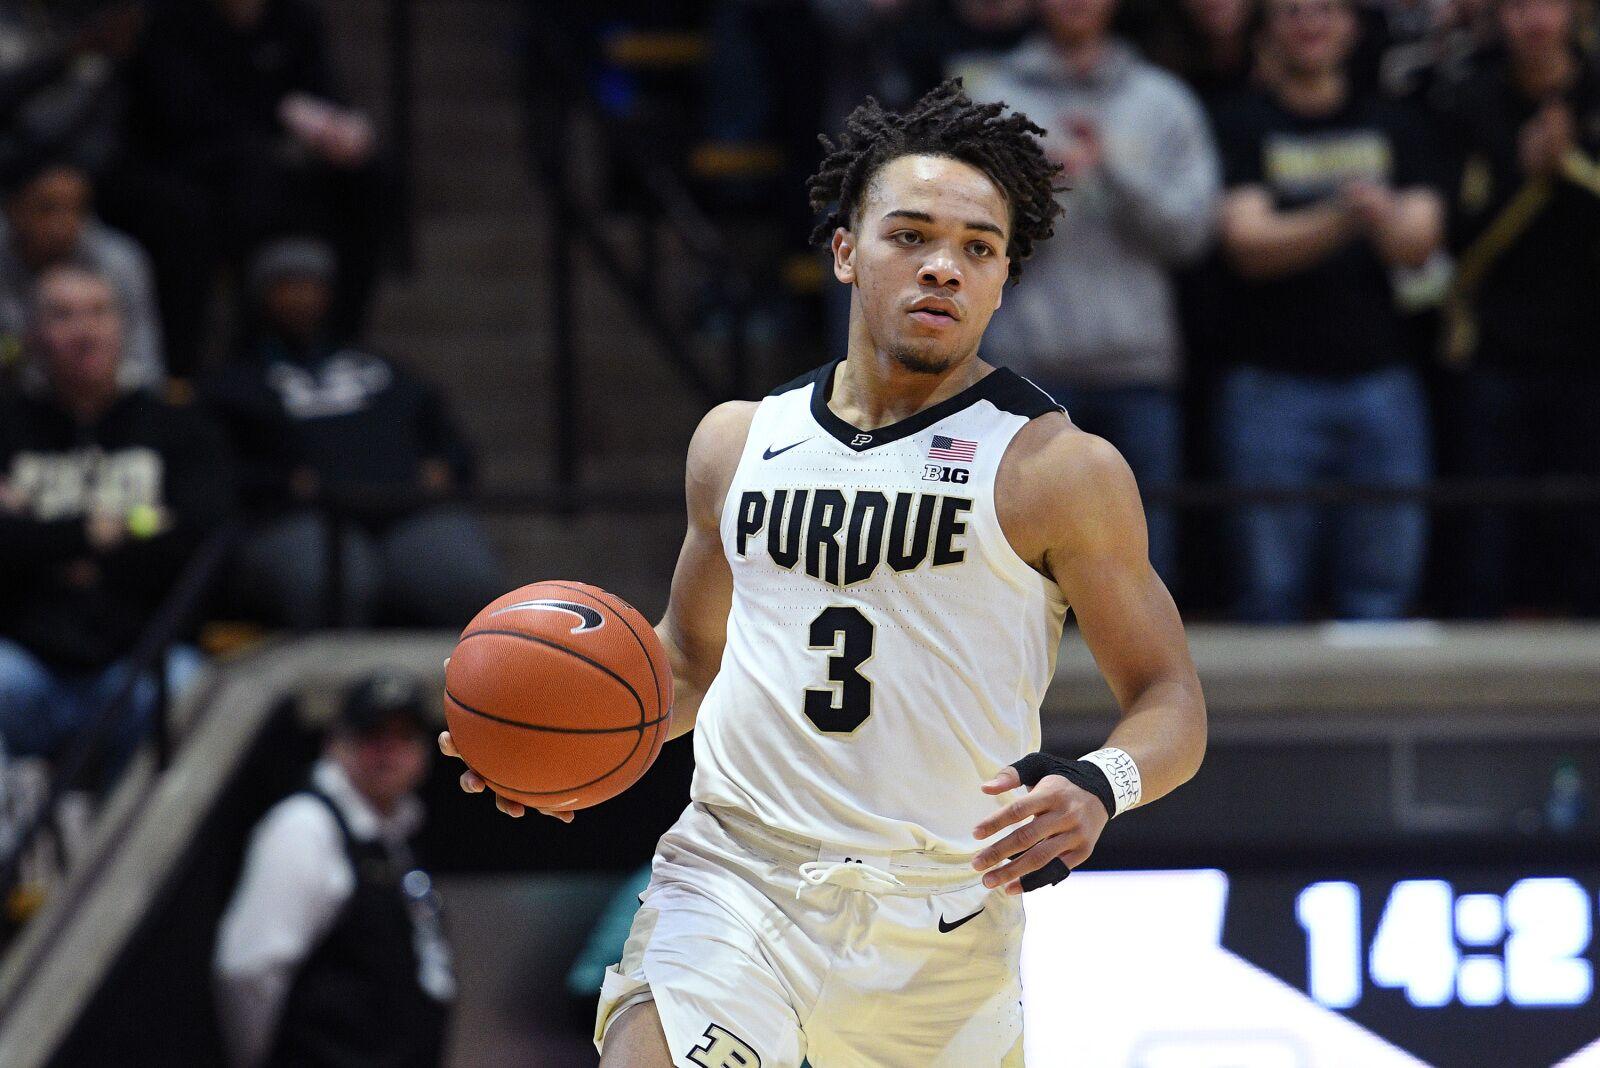 621144deec2 Purdue vs Indiana live stream  Watch college basketball online